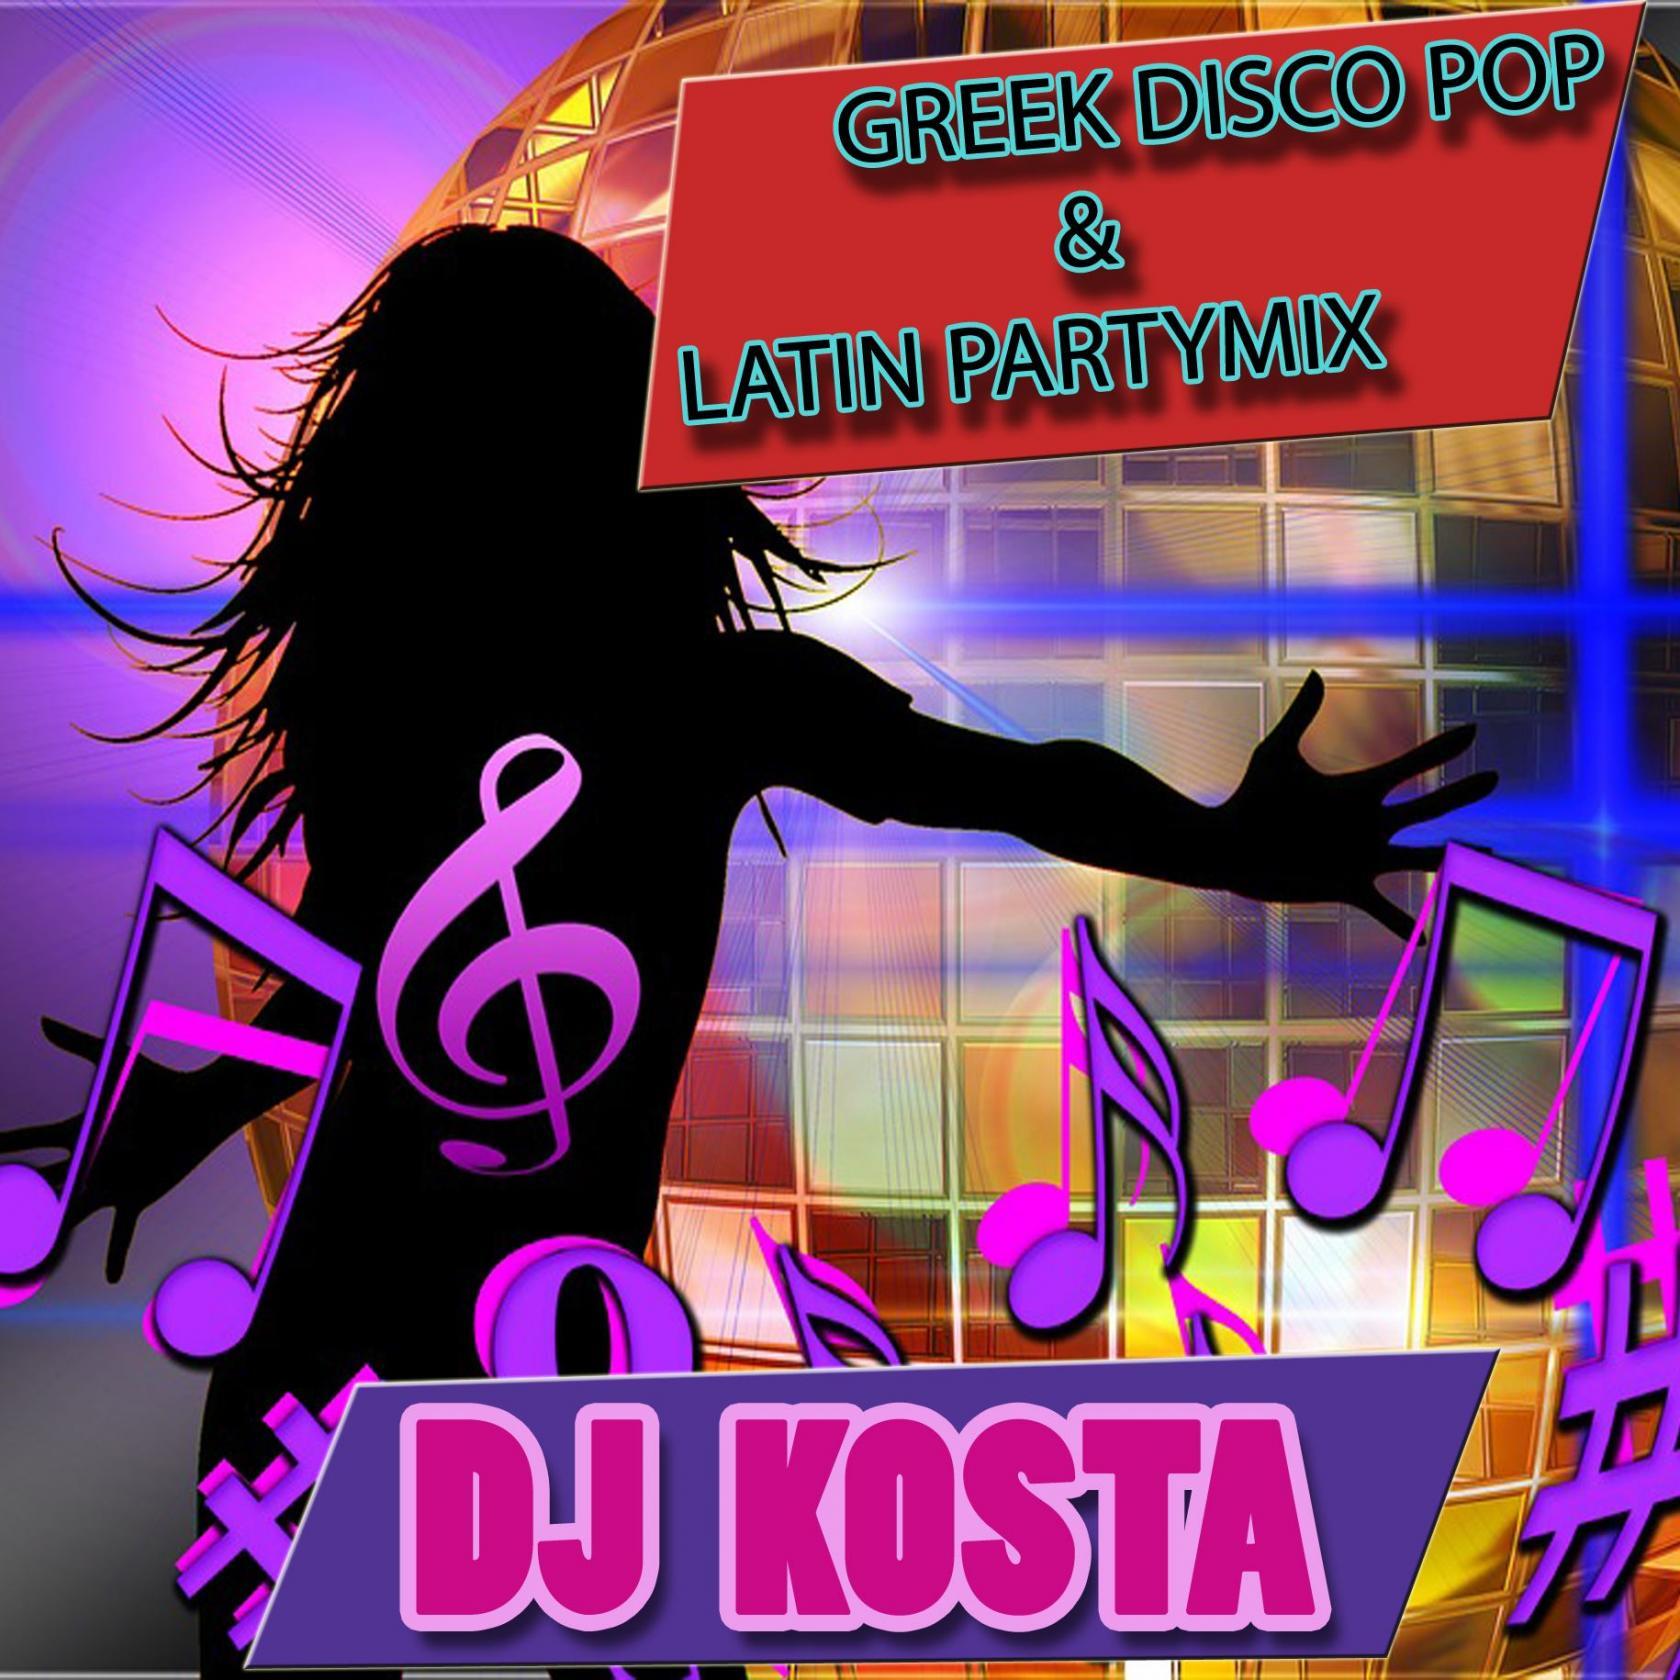 Greek Disco Pop & Latin Partymix